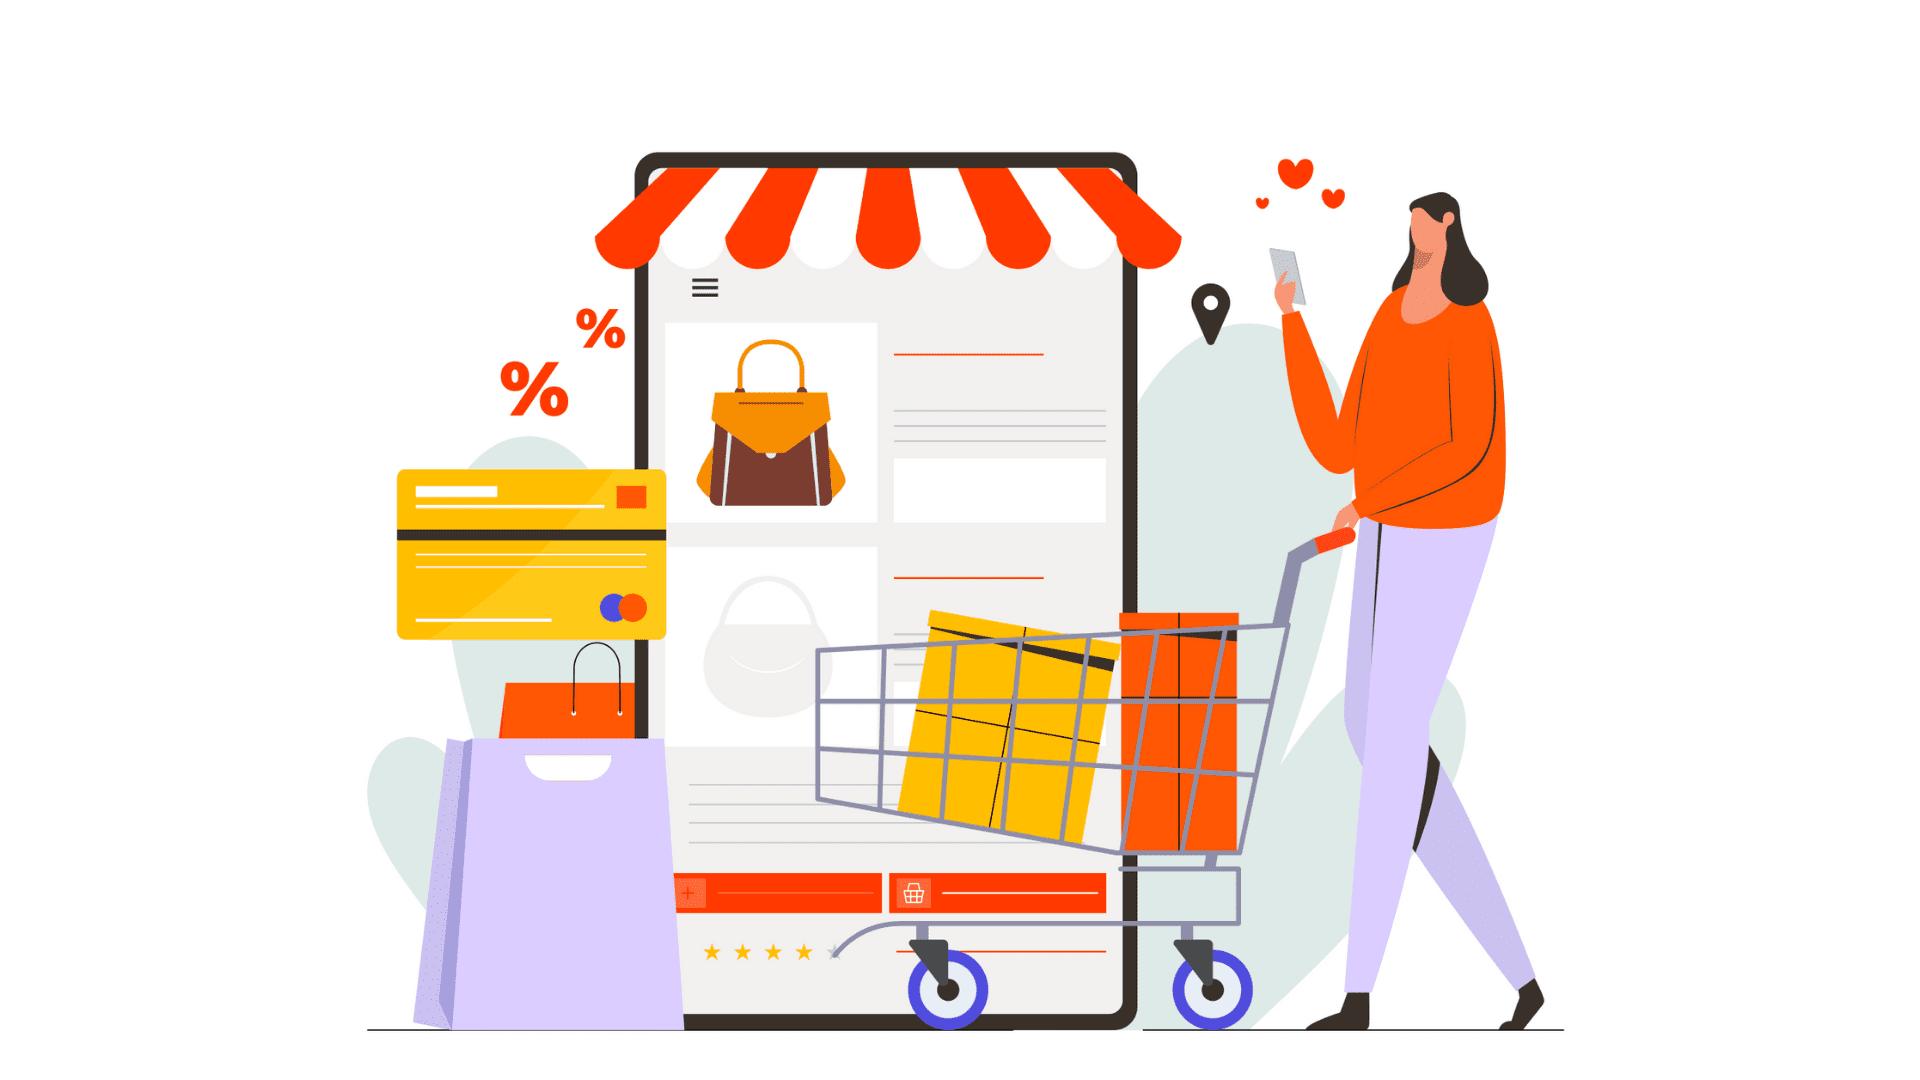 Build shopping app